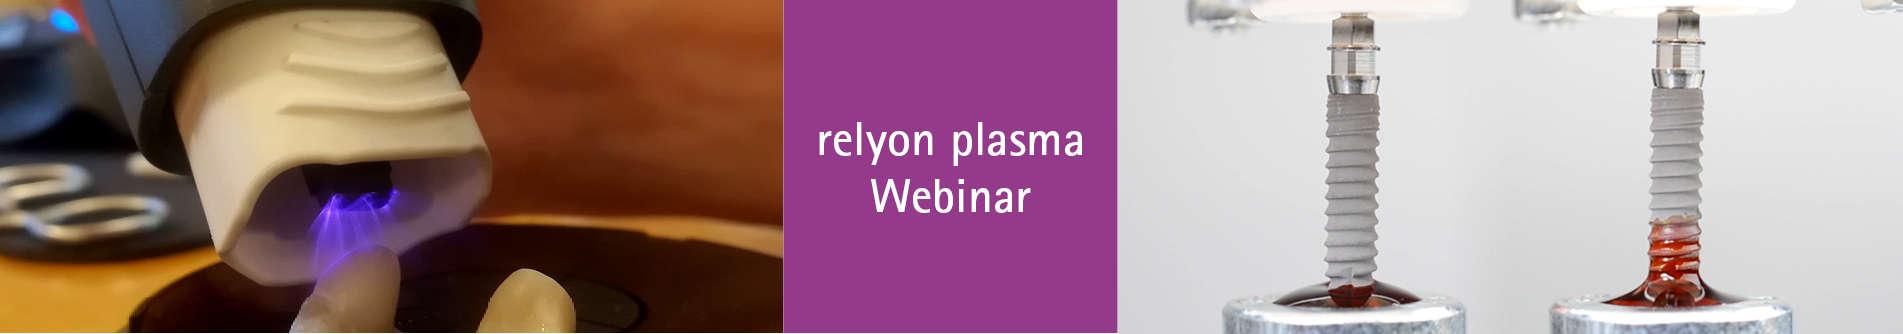 relyon plasma Dentalwebinar